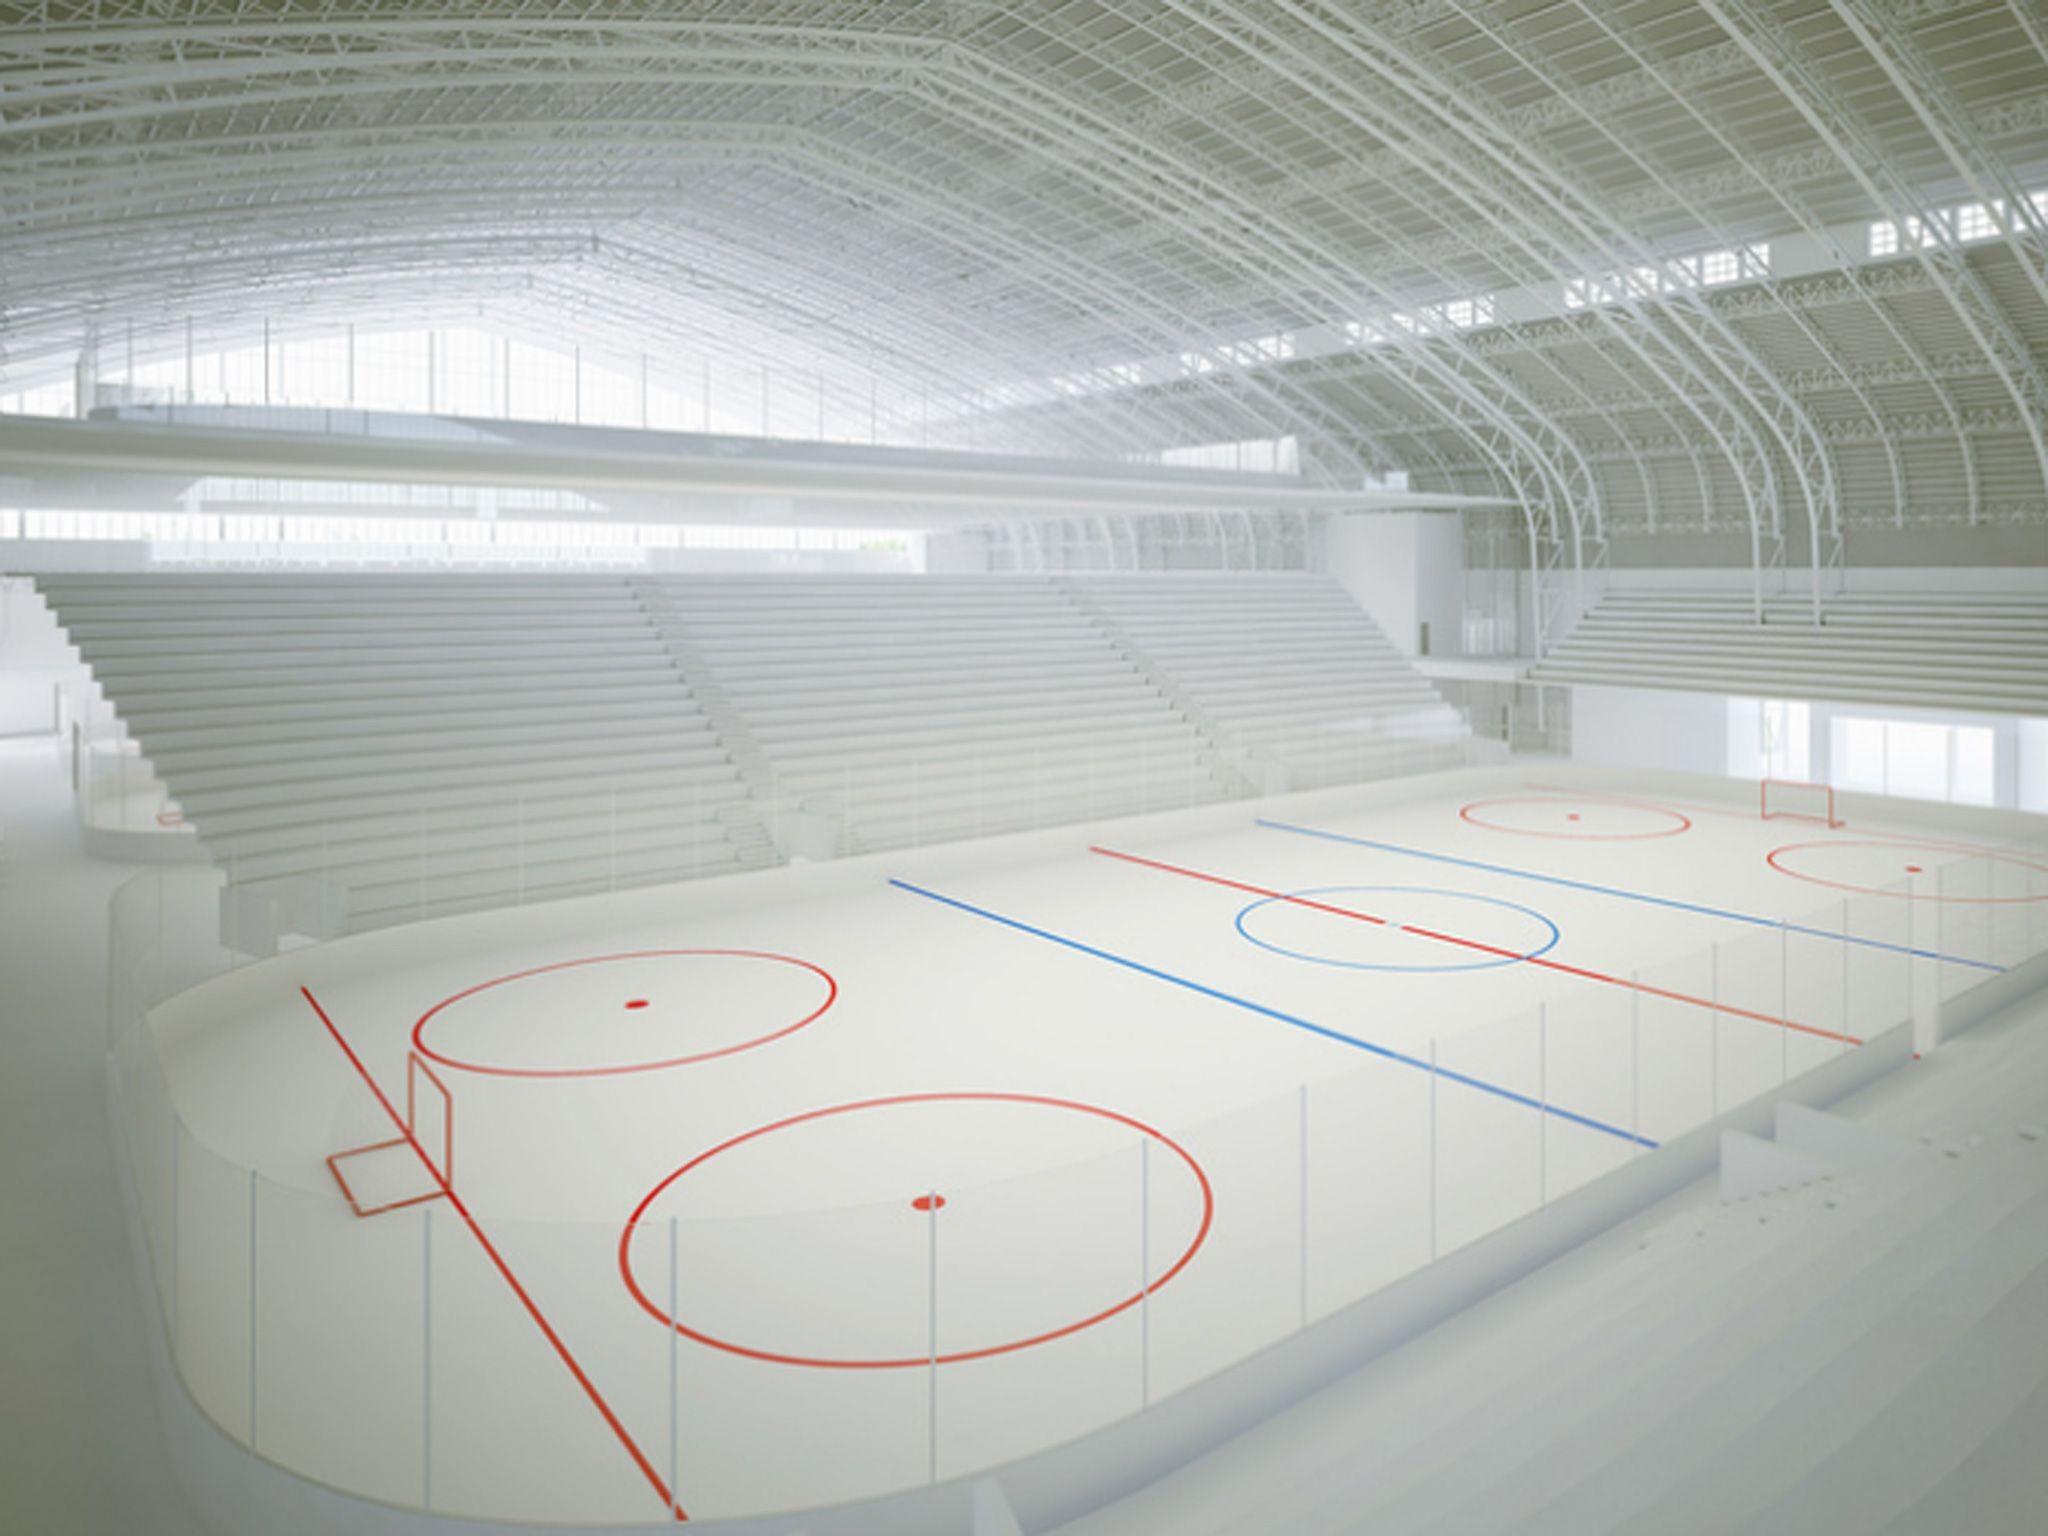 Bronx armory to become ice hockey, skating rinks .